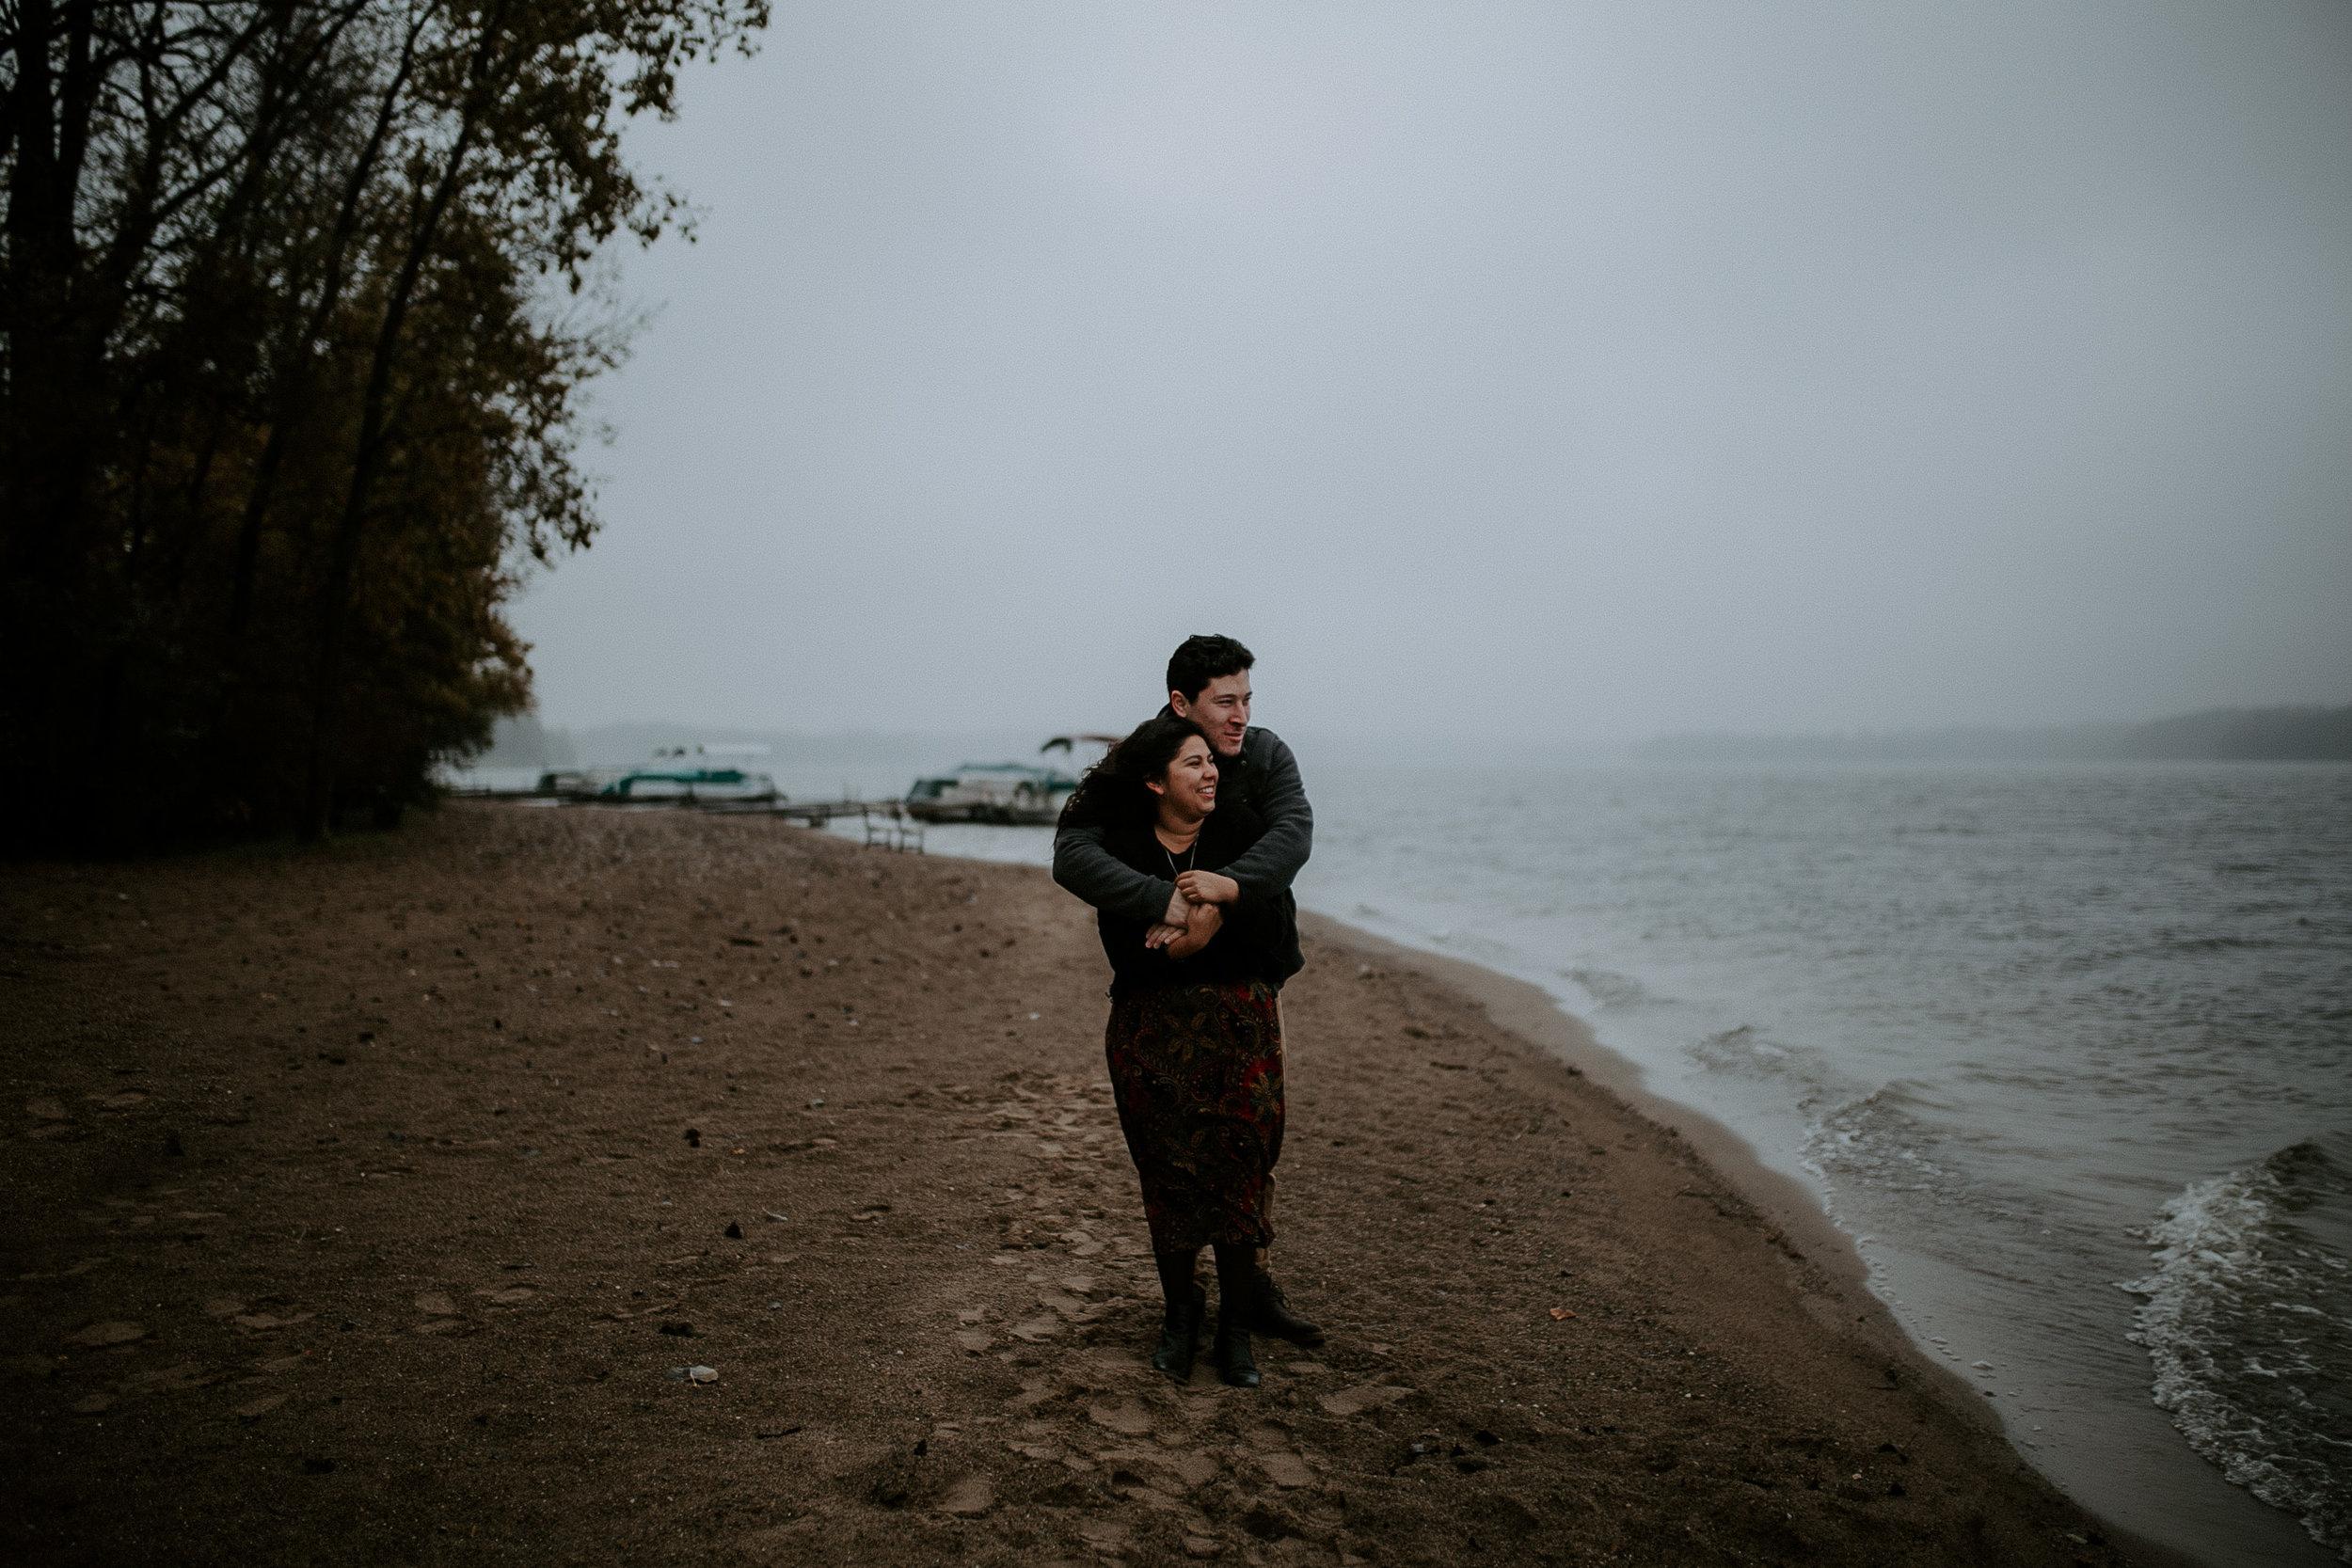 STEPH+DAN-COUPLE-REAGANLYNNPHOTOGRAPHY-PRAIRIECREEKRESERVOIR-MUNCIE-INDIANA-2.jpg